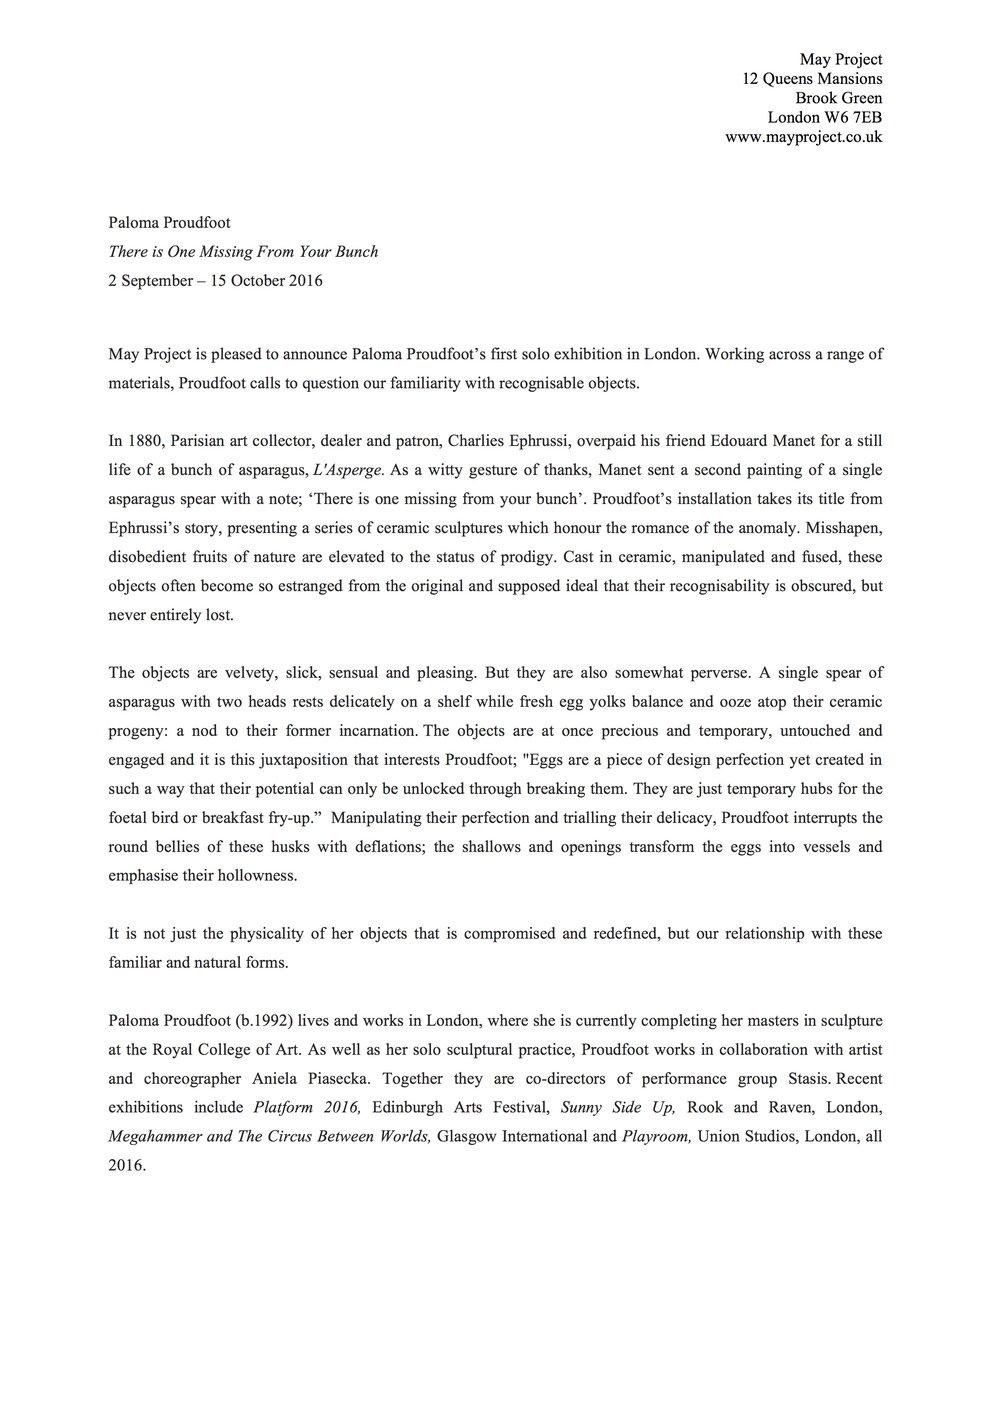 Paloma Proudfoot press release copy.jpg